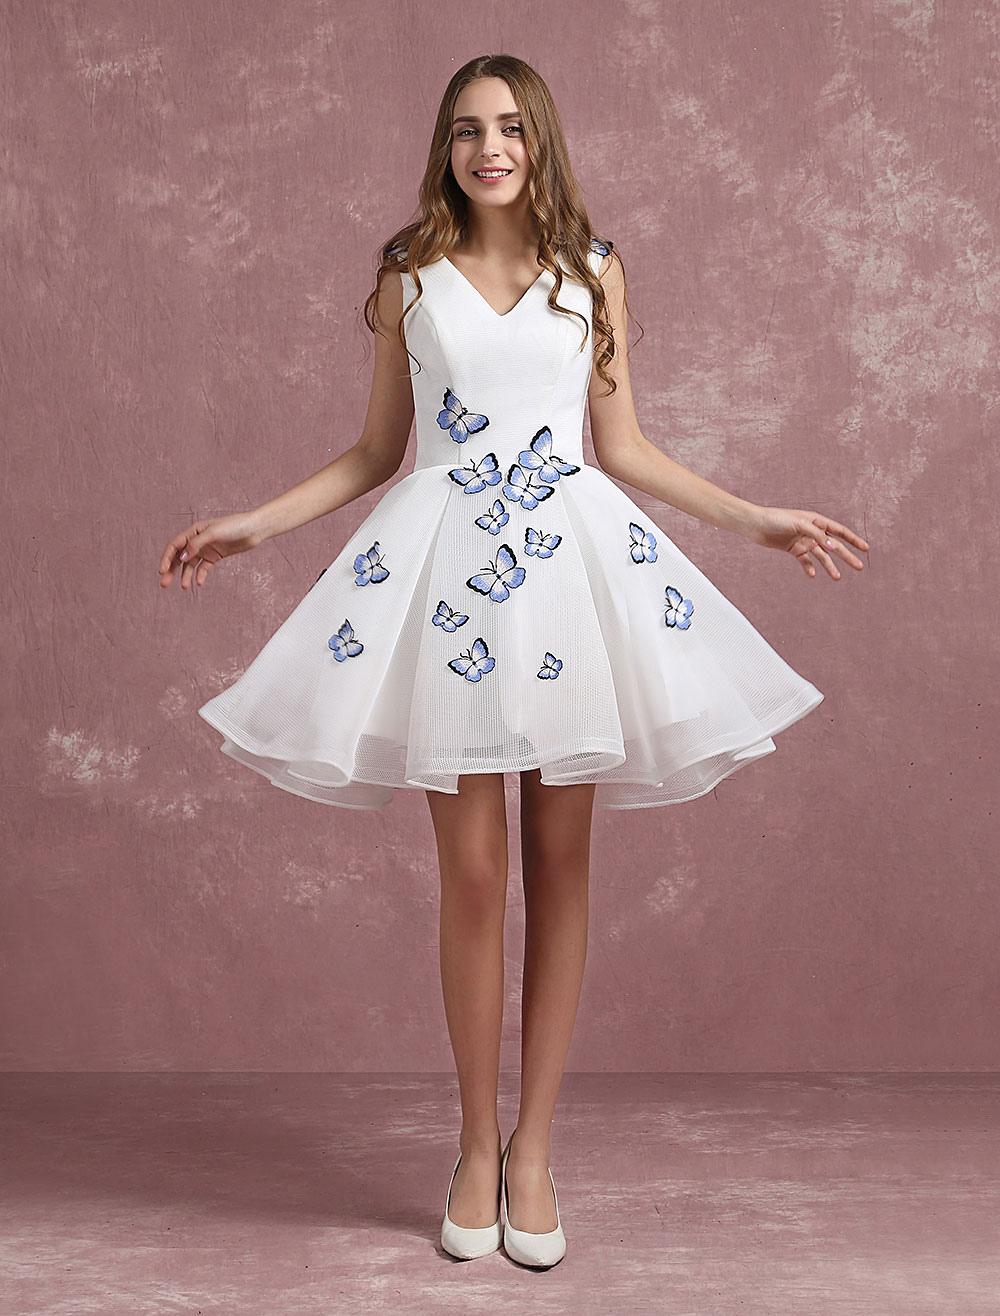 4d6c702d4cb ... White Prom Dresses 2019 Short Cocktail Dress V Neck Butterfly Beaded  Sleeveless A Line Homecoming Dress ...